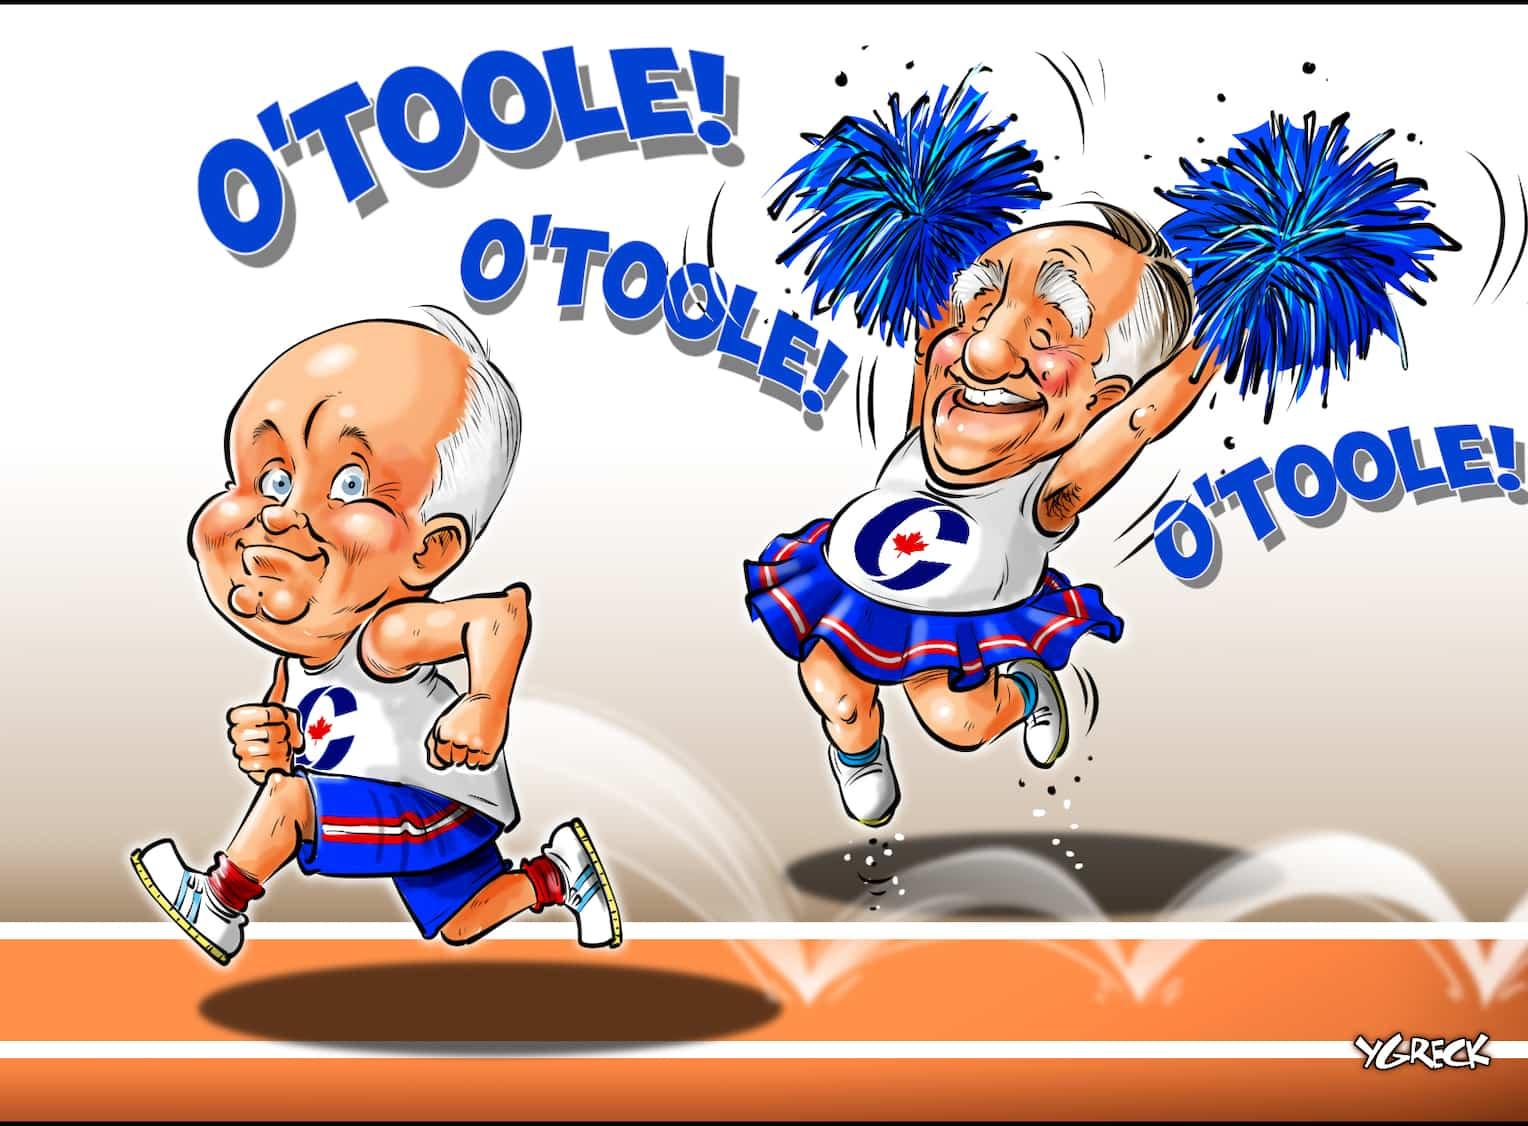 CARICATURES : politiques, judiciaires, sportives ... etc.    (suite 2) - Page 25 O_Toole_cheerleader_copied9644cfe-67c3-4c37-87bc-3463ef4892d2_ORIGINAL